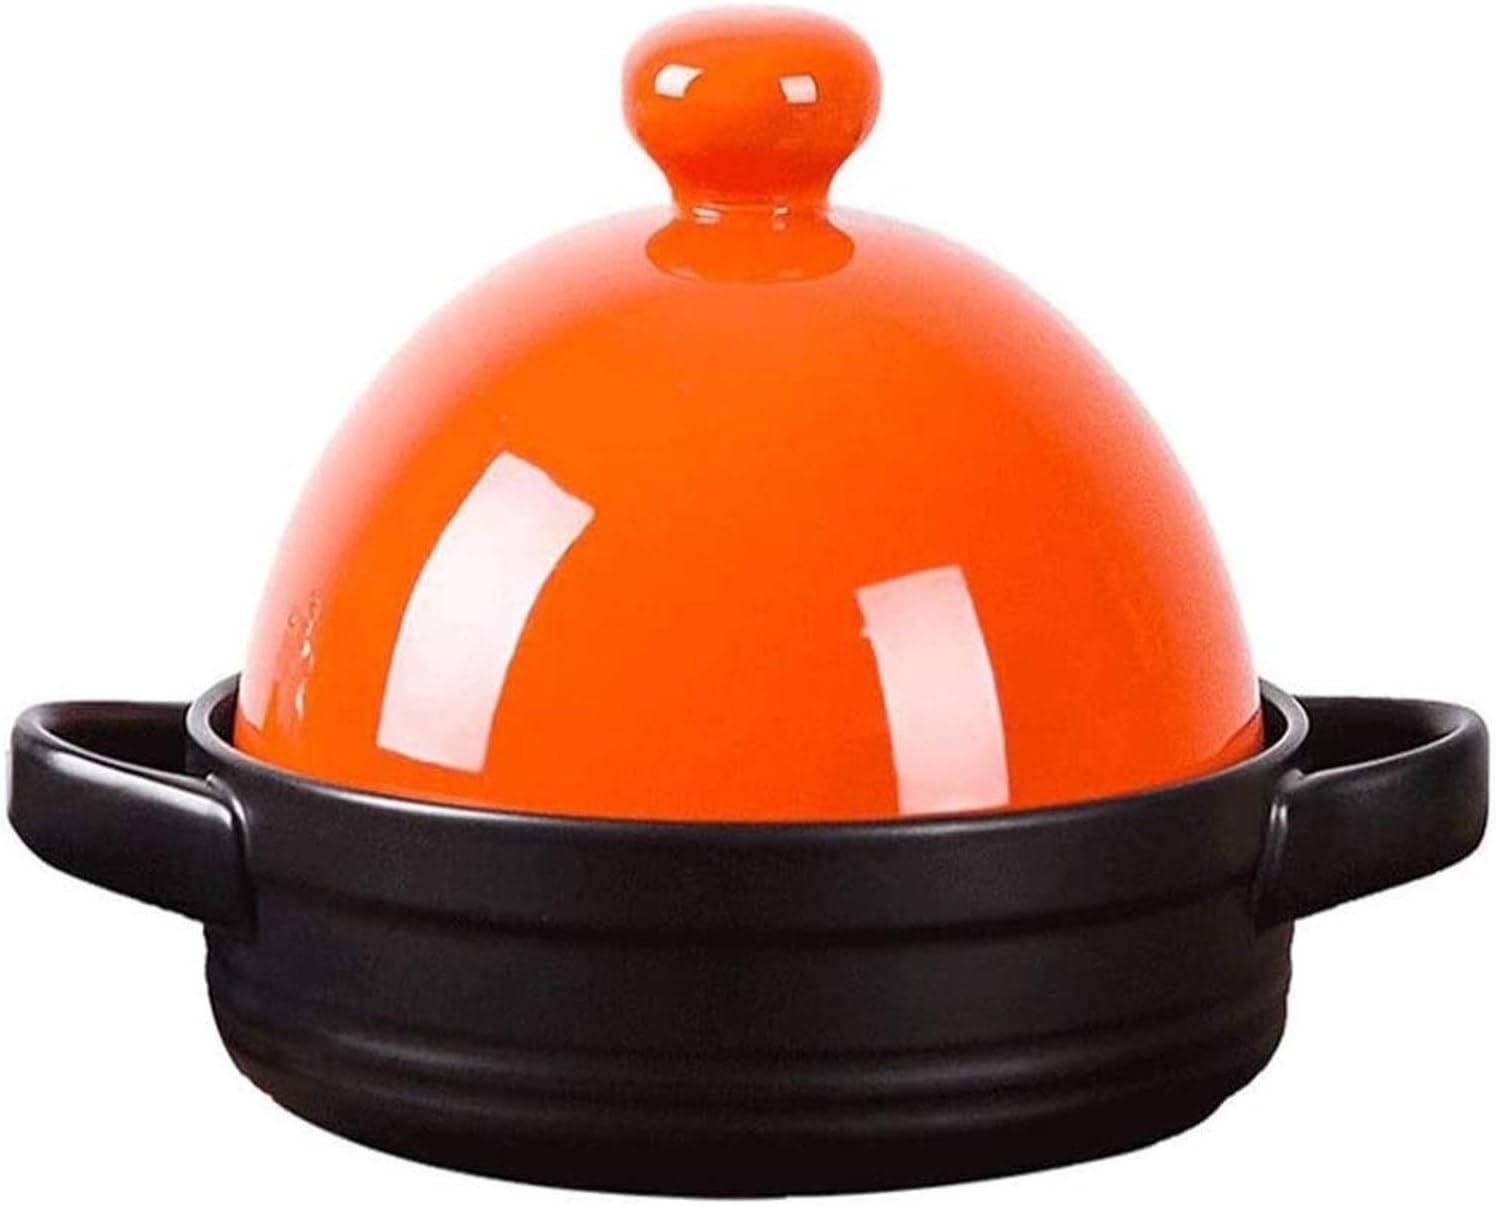 Clay Pot Earthen Ceramic Cookware Cast 5 ☆ Max 71% OFF popular Classic Roun Enameled